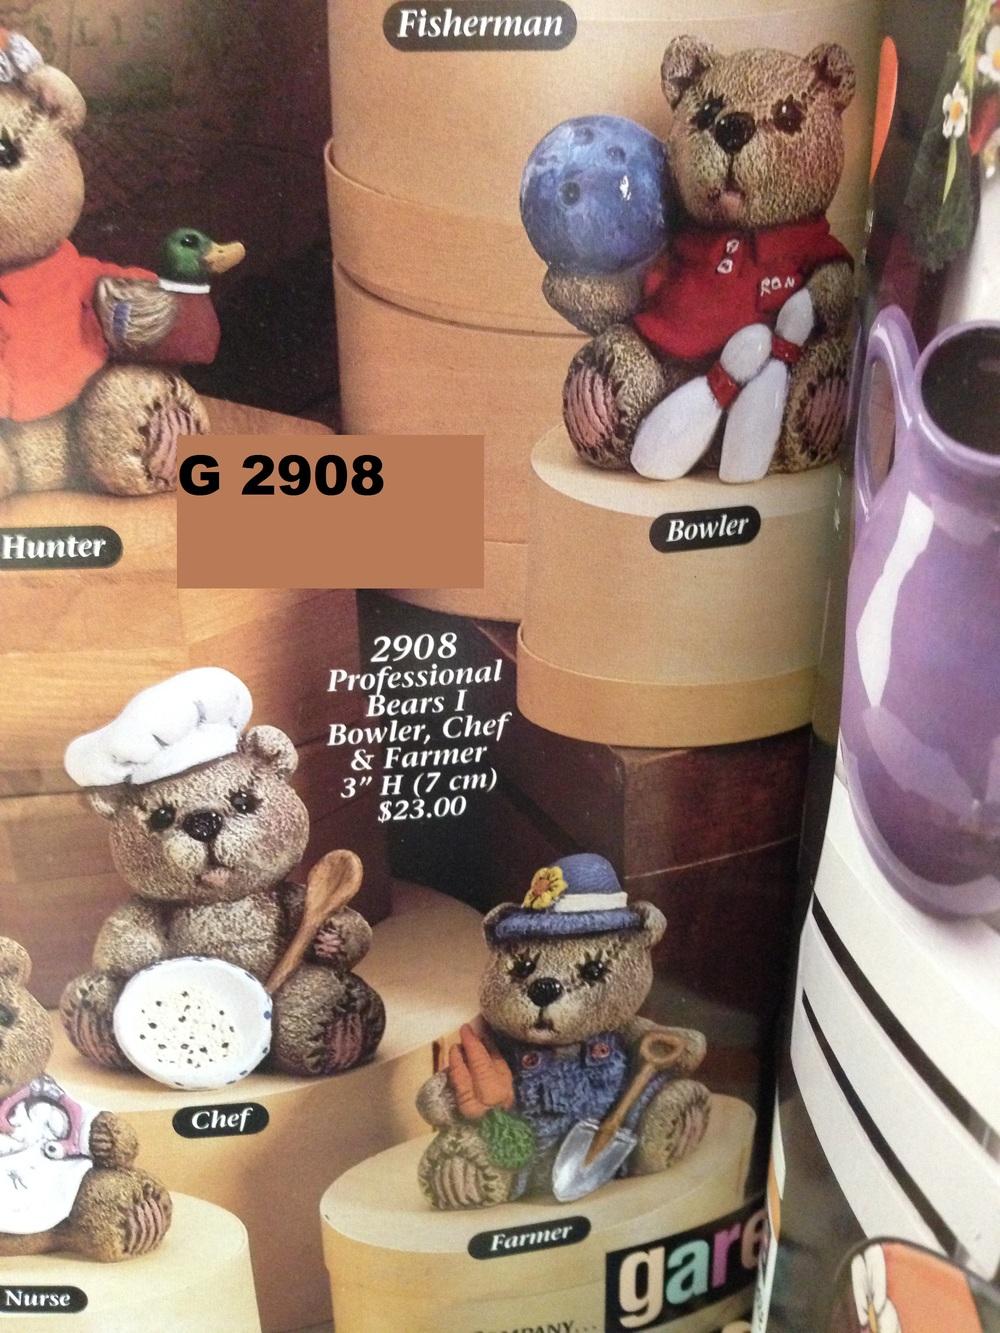 G2908.jpg